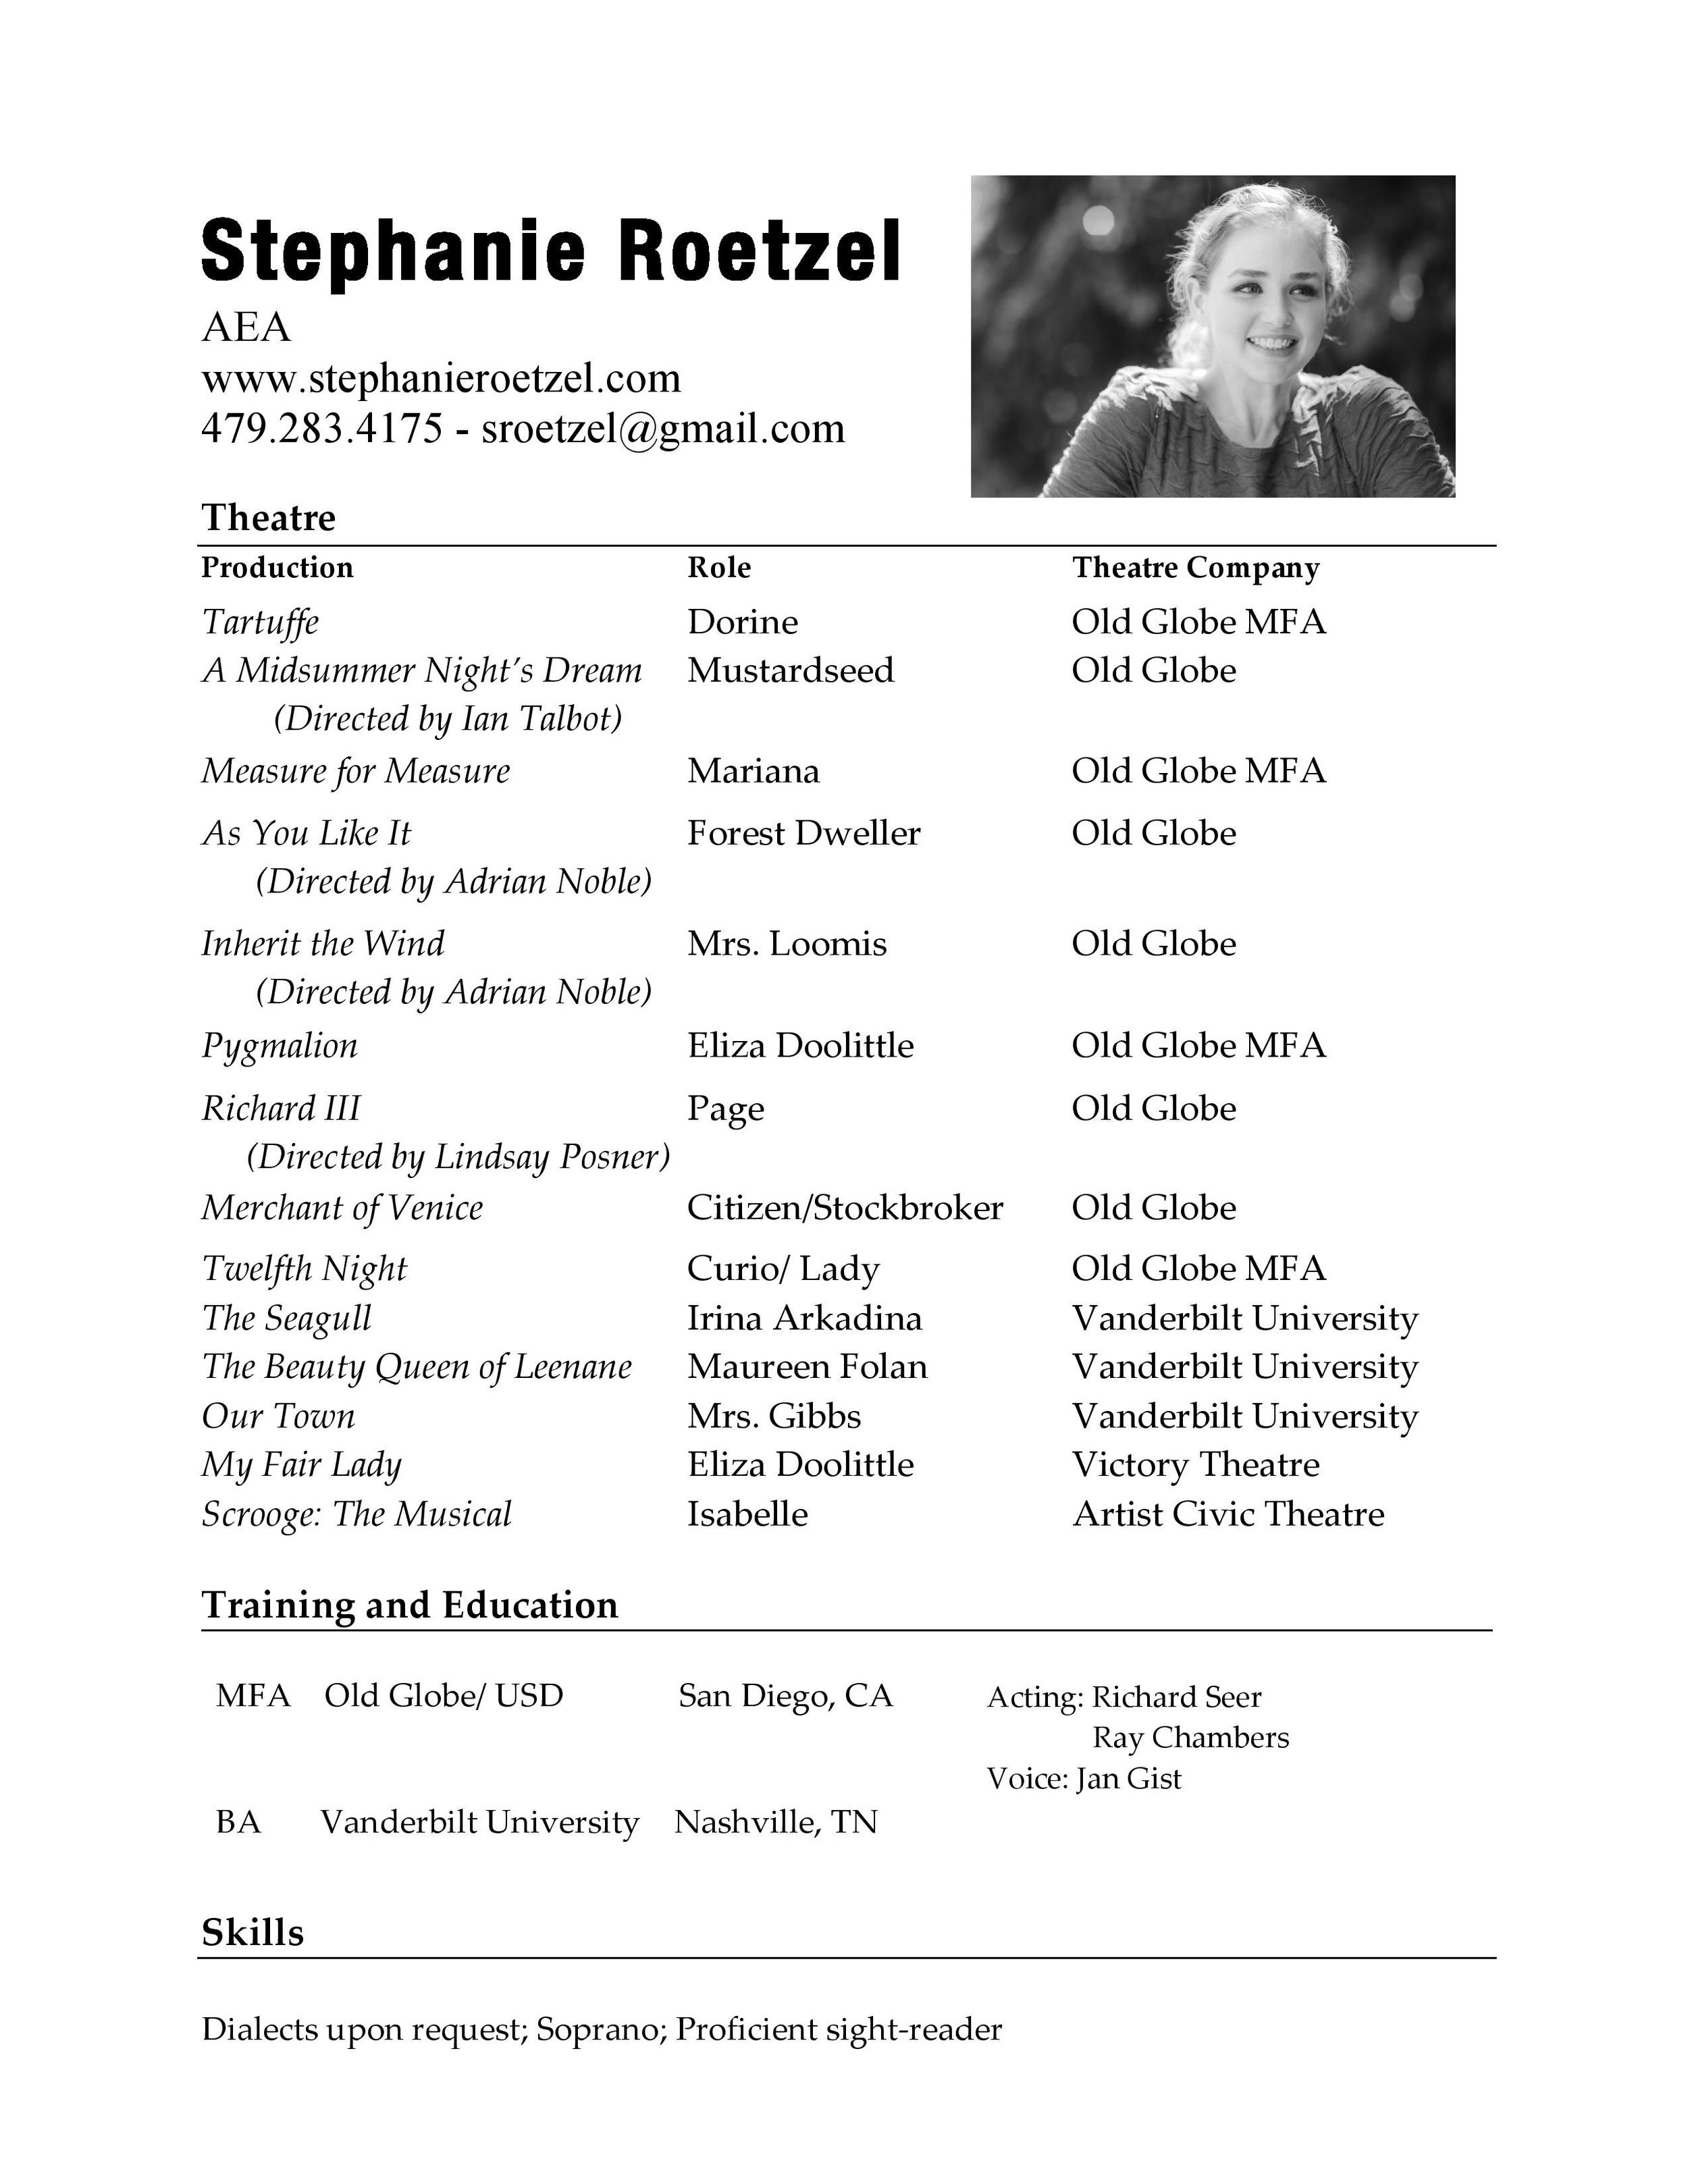 StephanieRoetzelResume-page-001.jpg